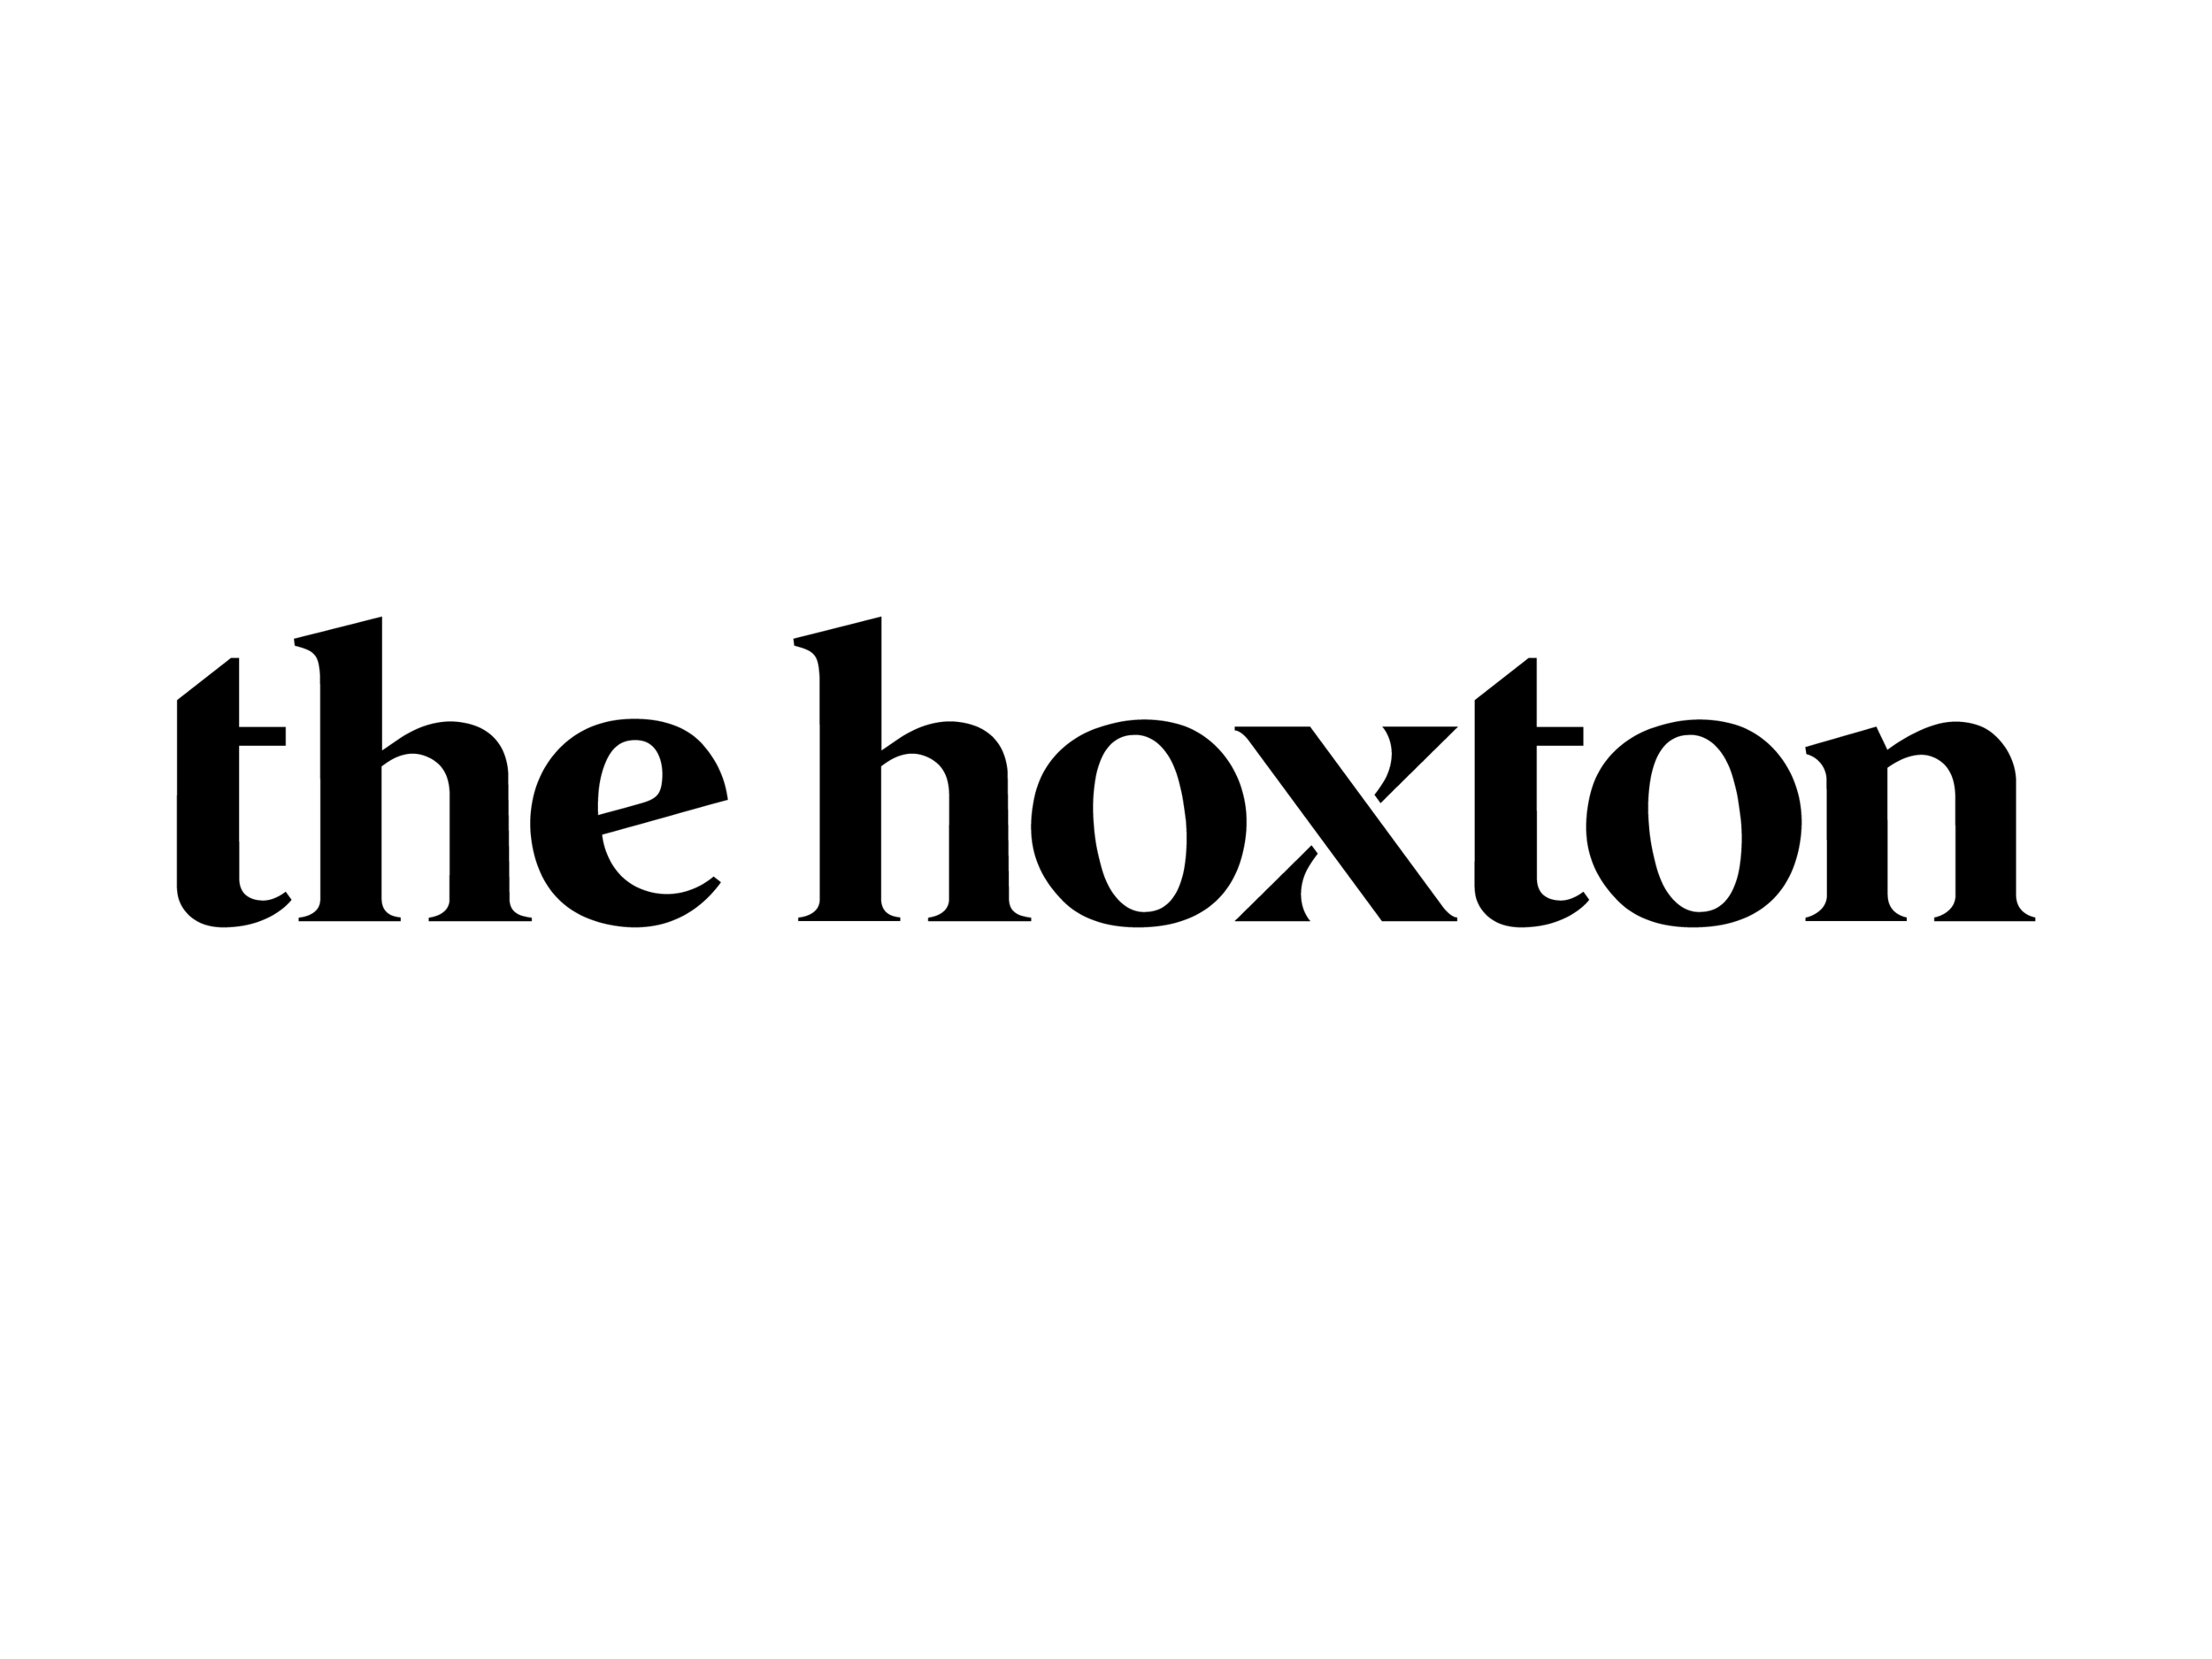 hoxton logo file.png